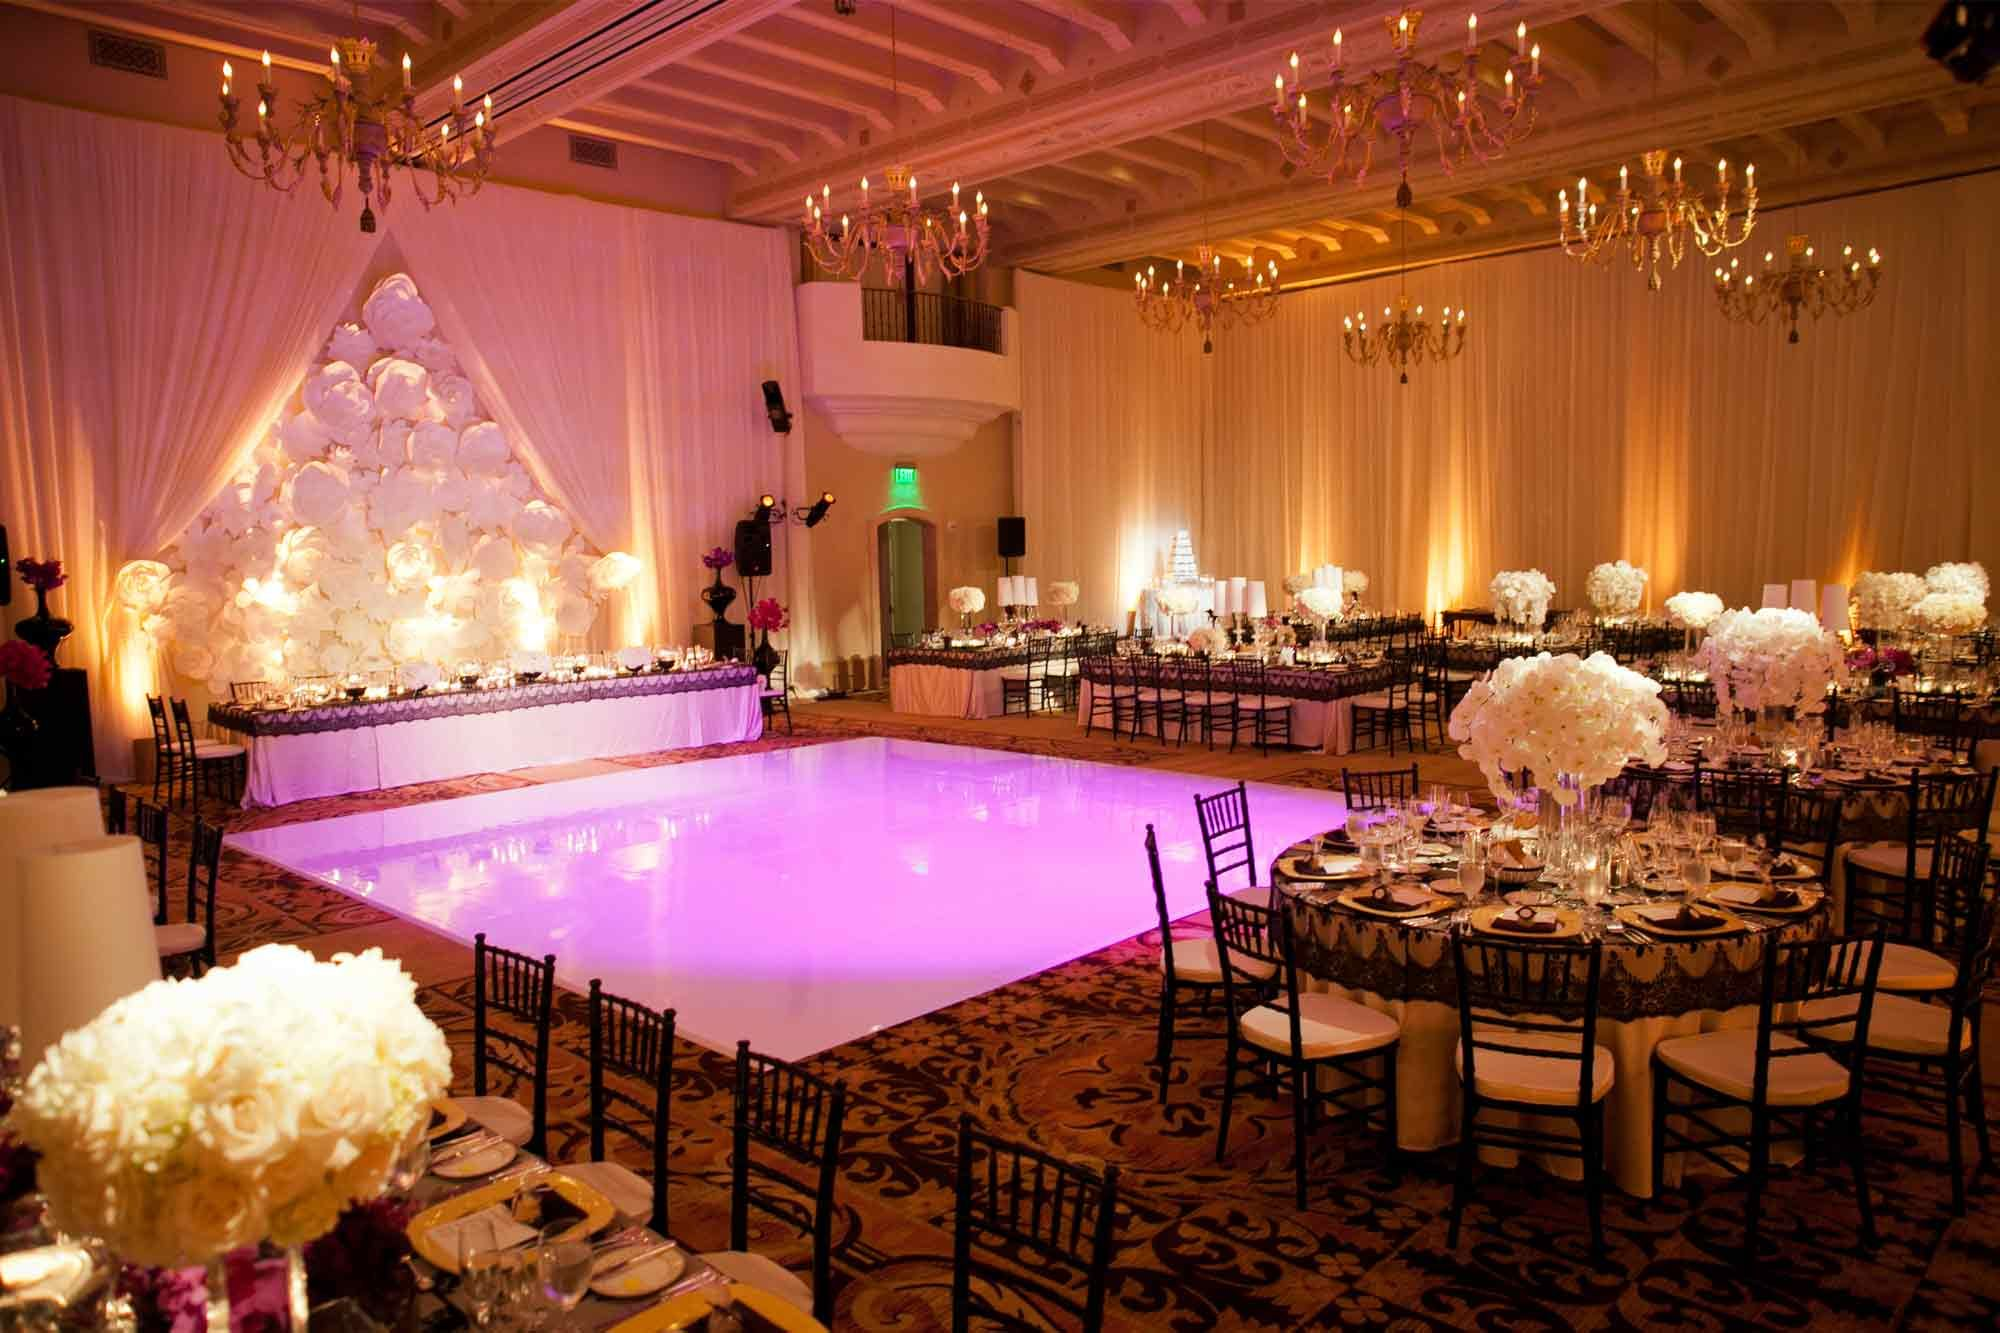 Beverly Hills Wedding Venues Montage Ballrooms Los Angeles Losangeles Weddings